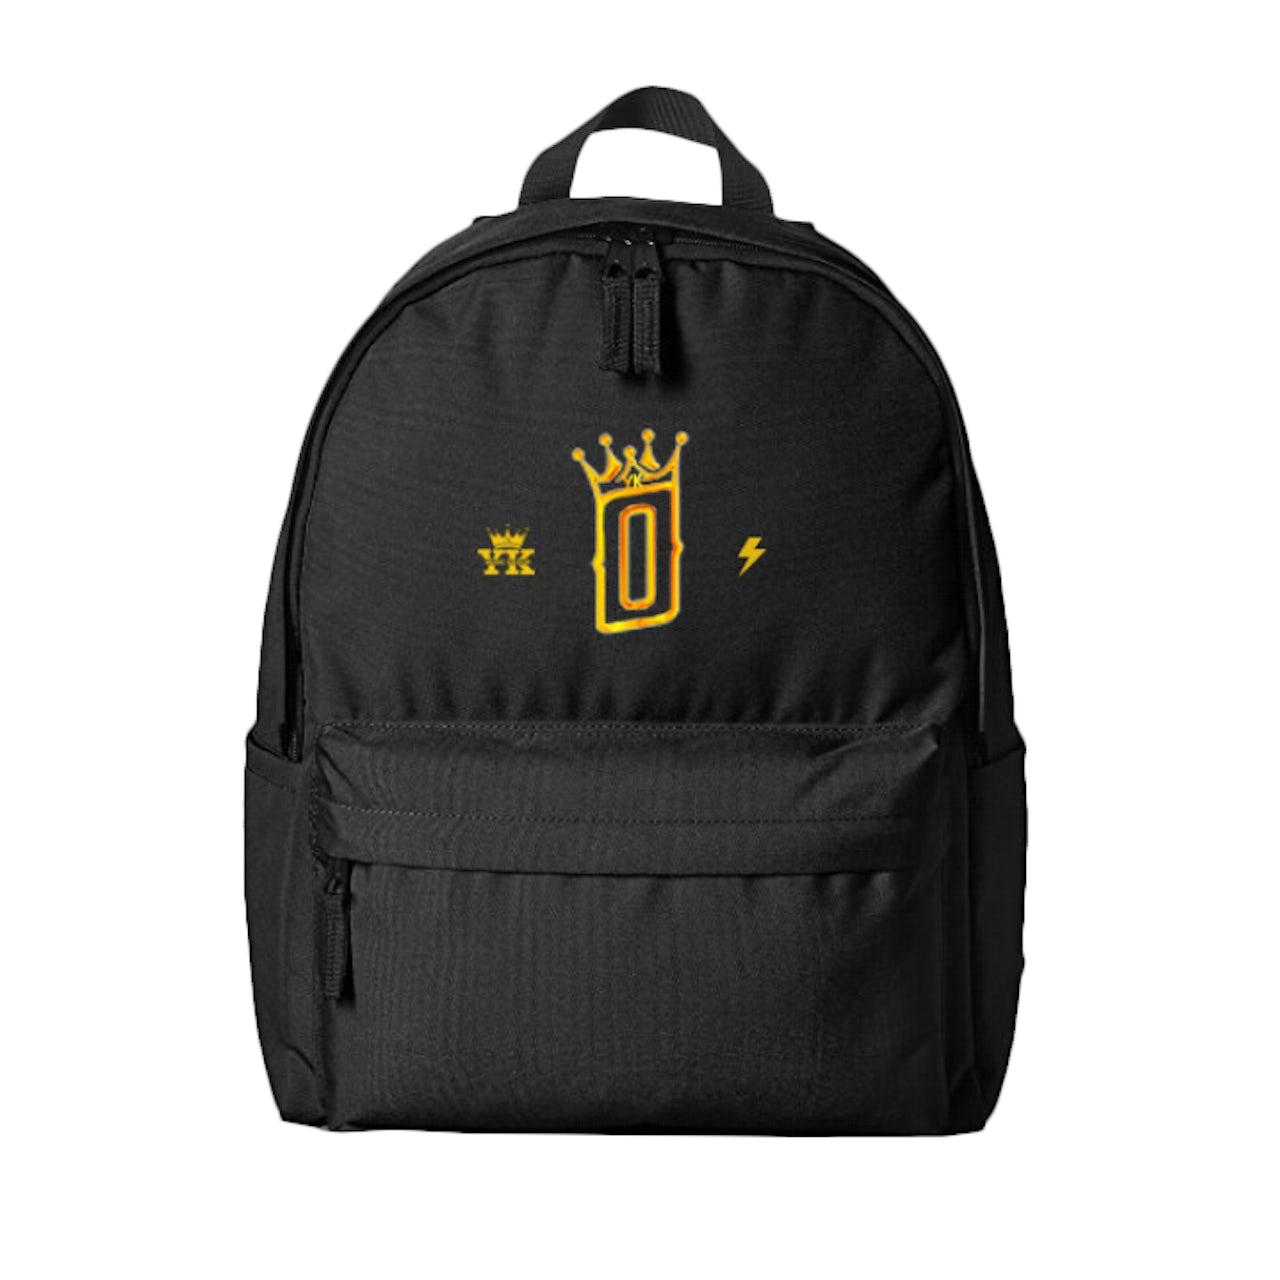 219fefde630 YK Osiris YK Backpack + Digital